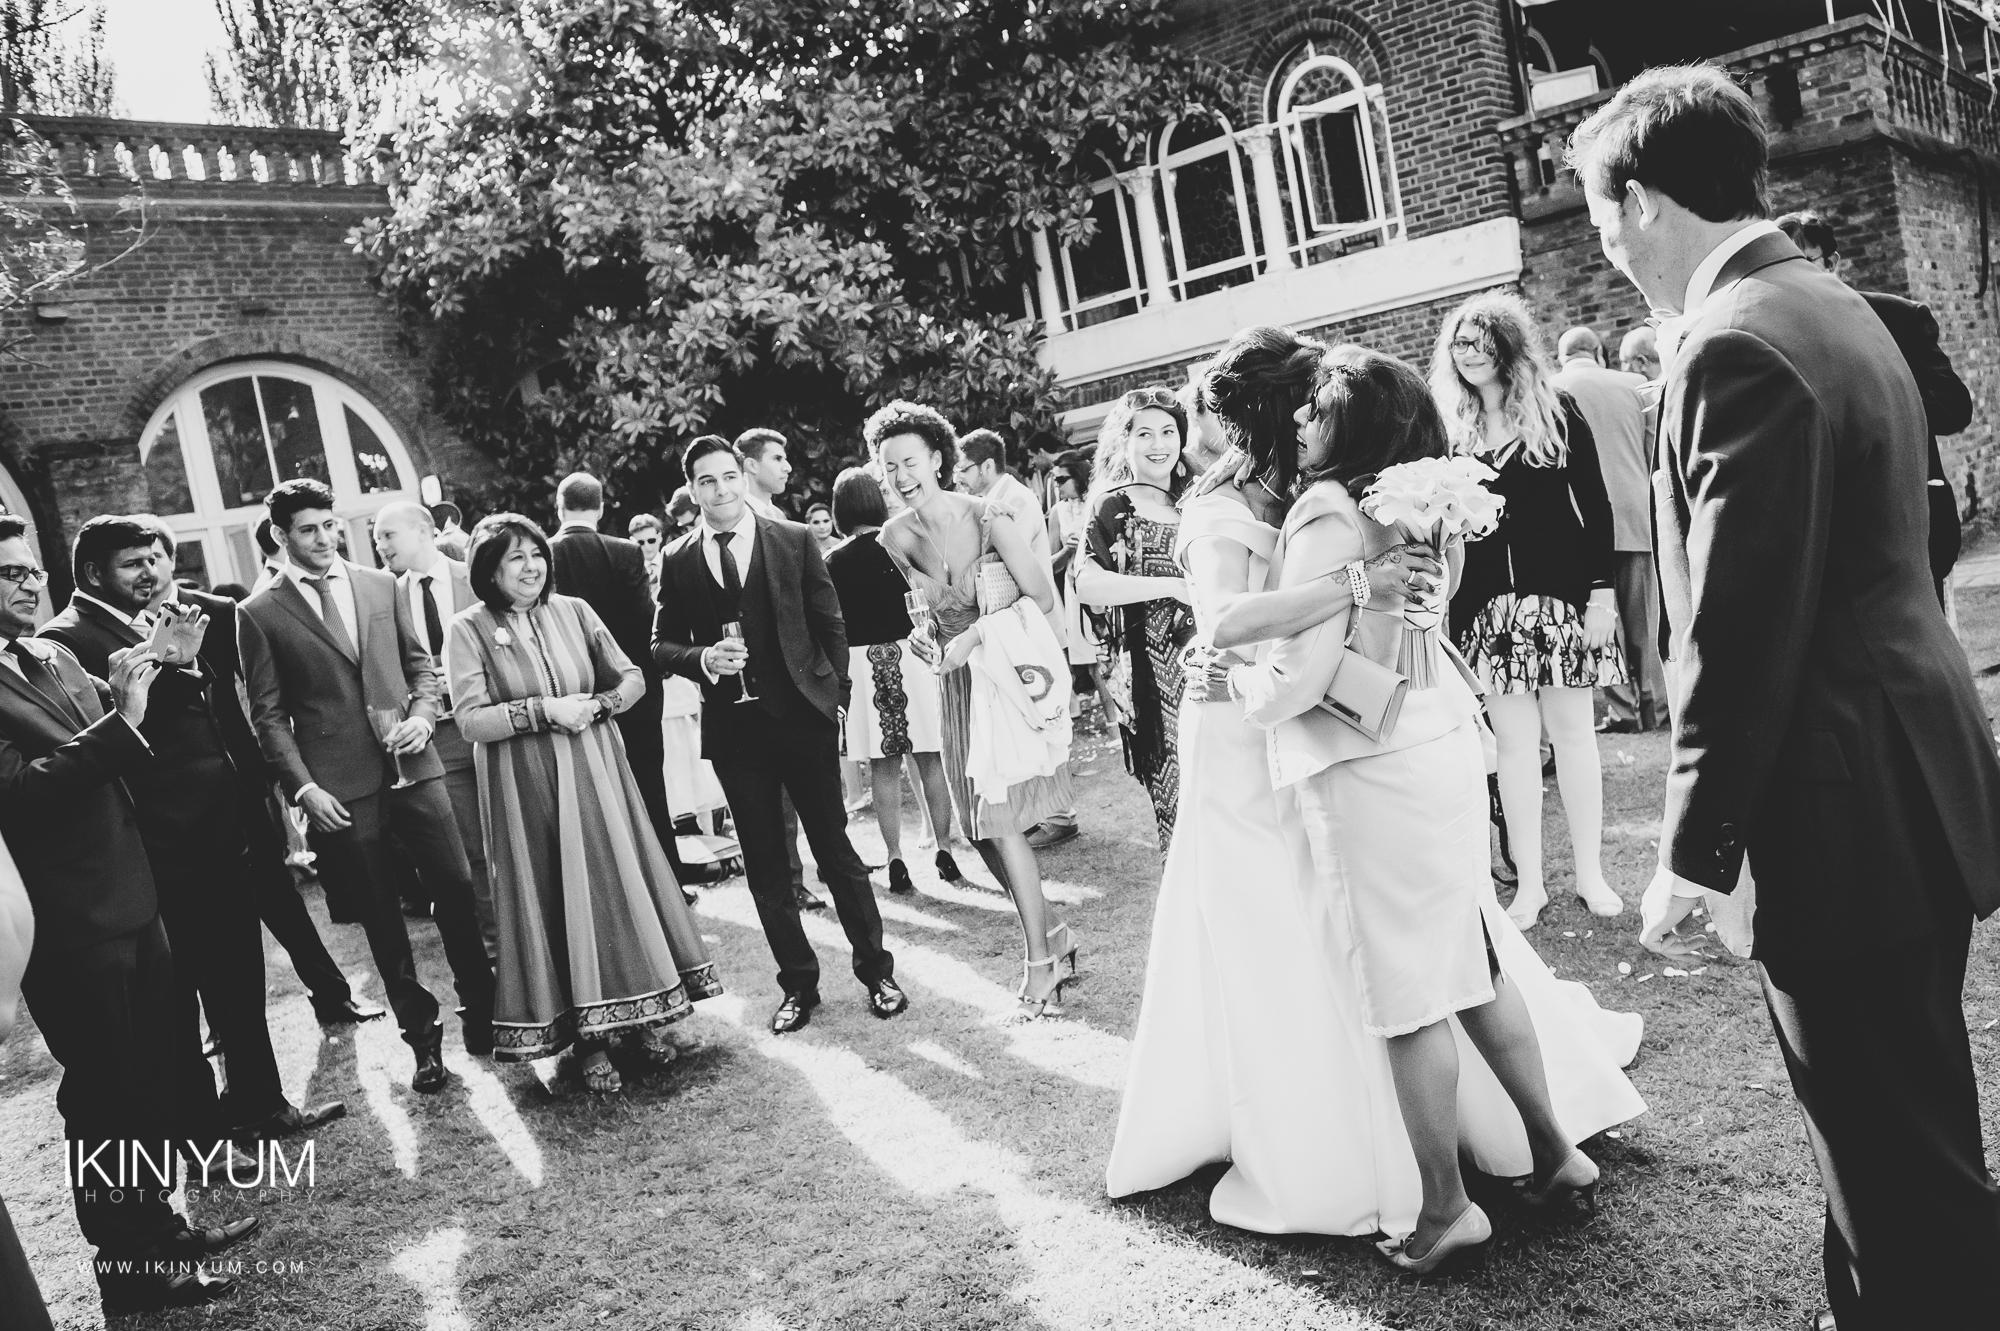 Holland Park Wedding - Ikin Yum Photography-0051.jpg